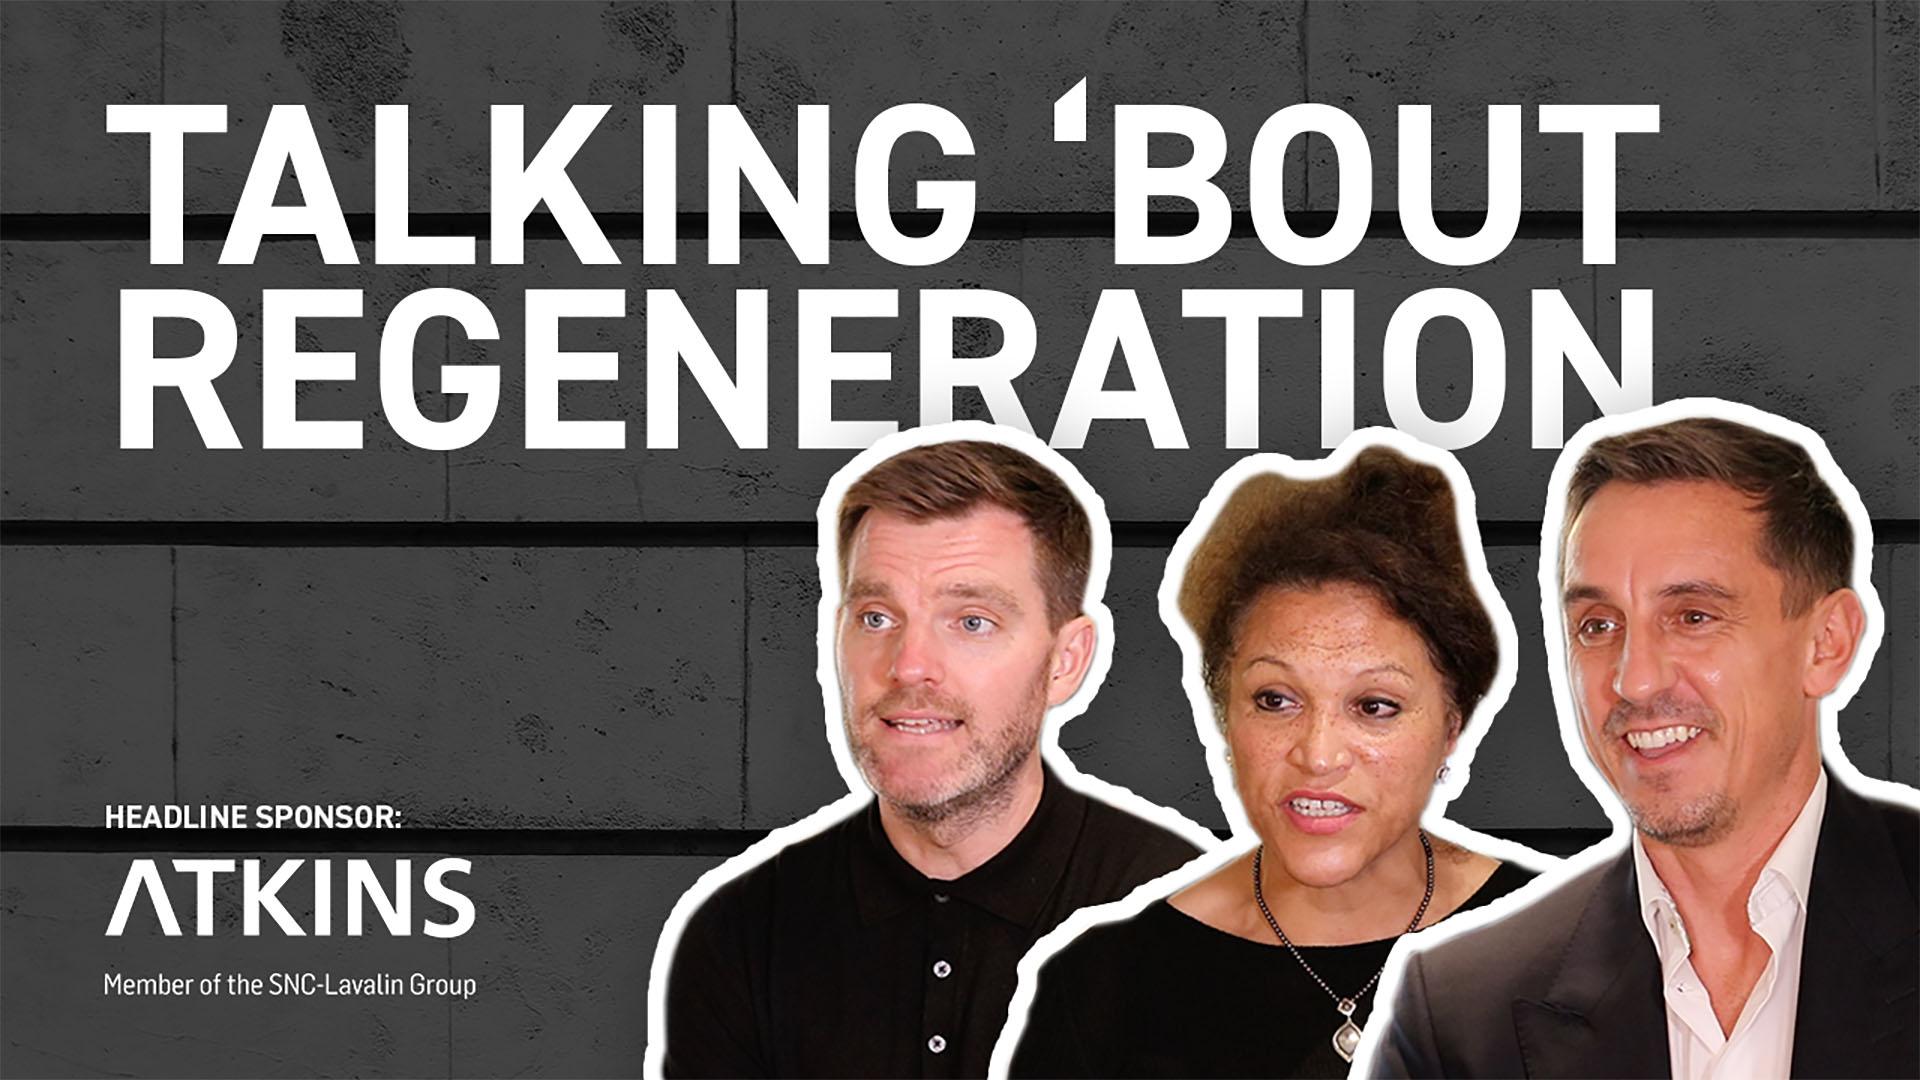 Talking 'Bout Regeneration 2021 – Video